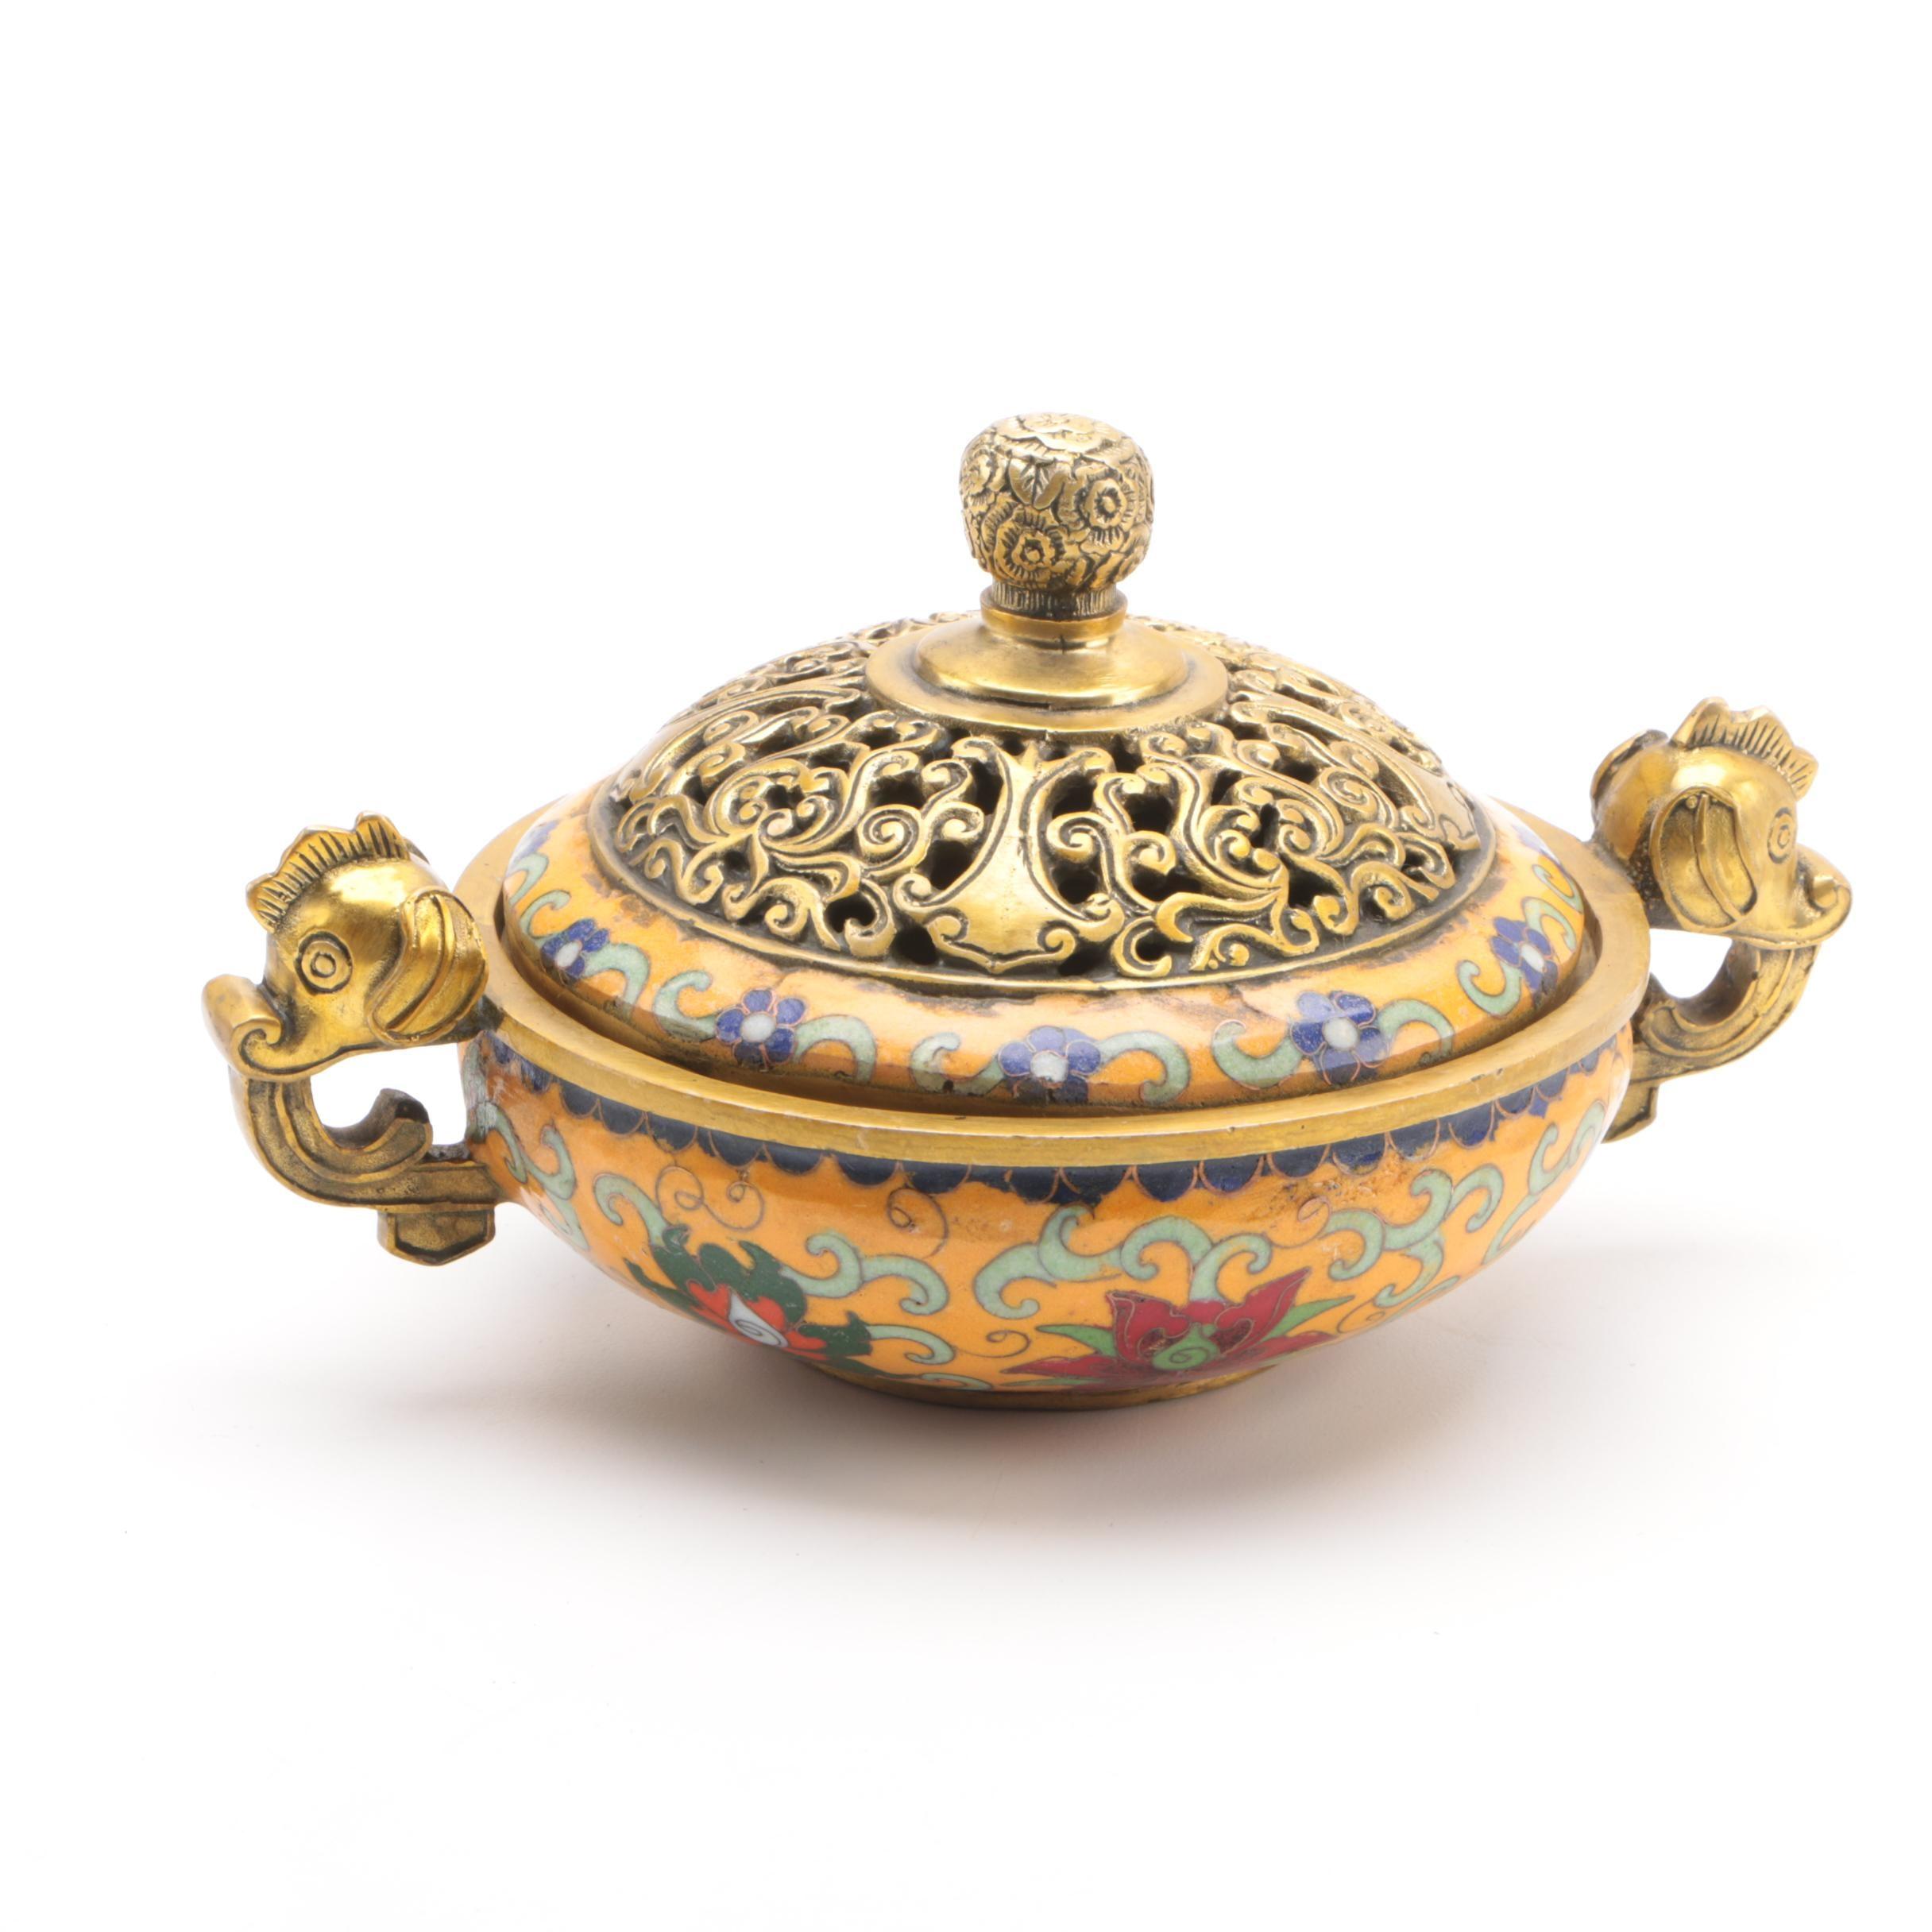 Republic Period Chinese Cloisonné Censer